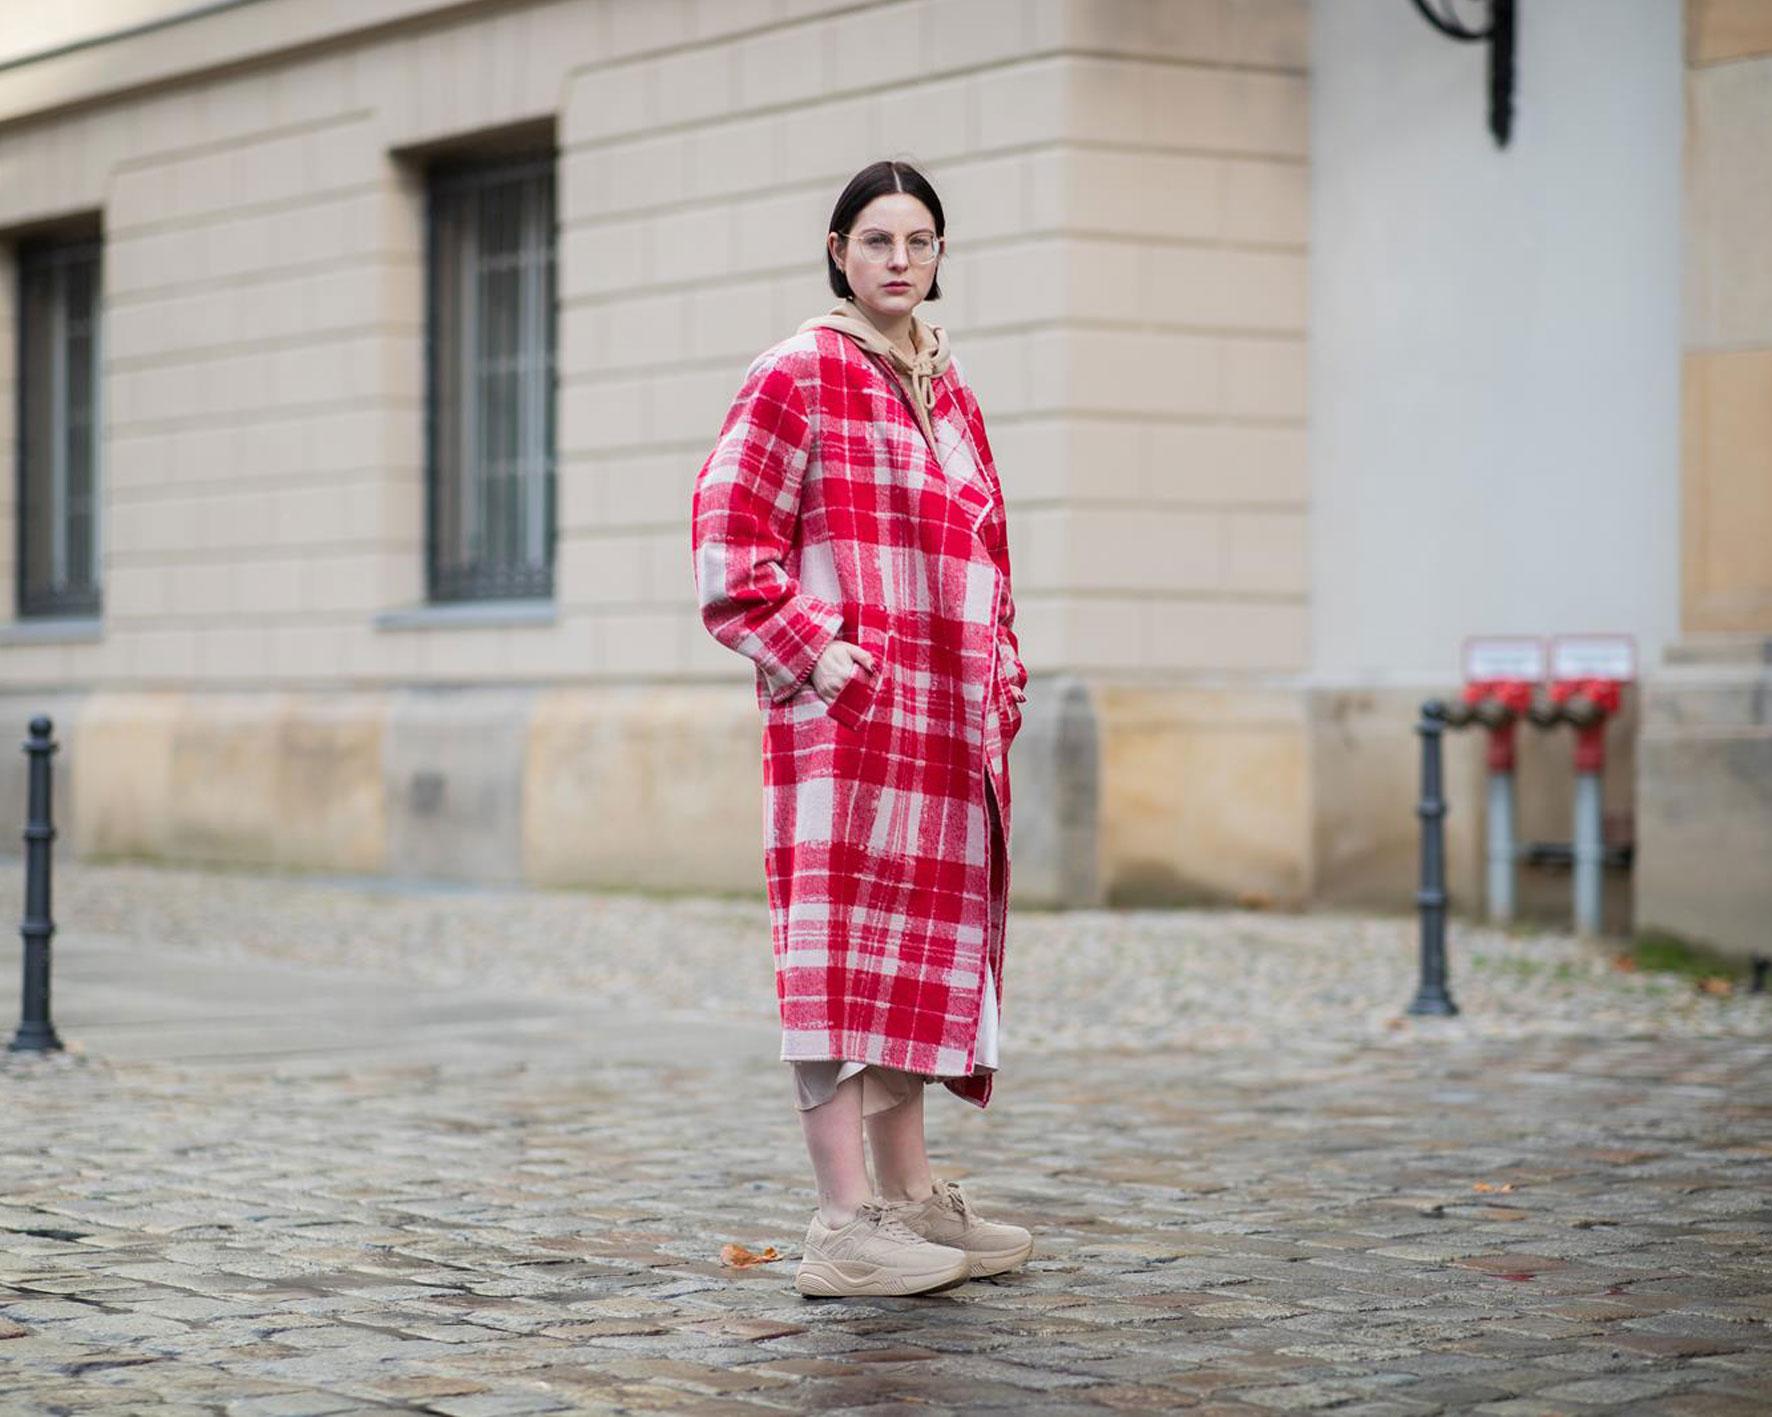 Routine Questions: Maria Barteczko aka fashionstylistmb